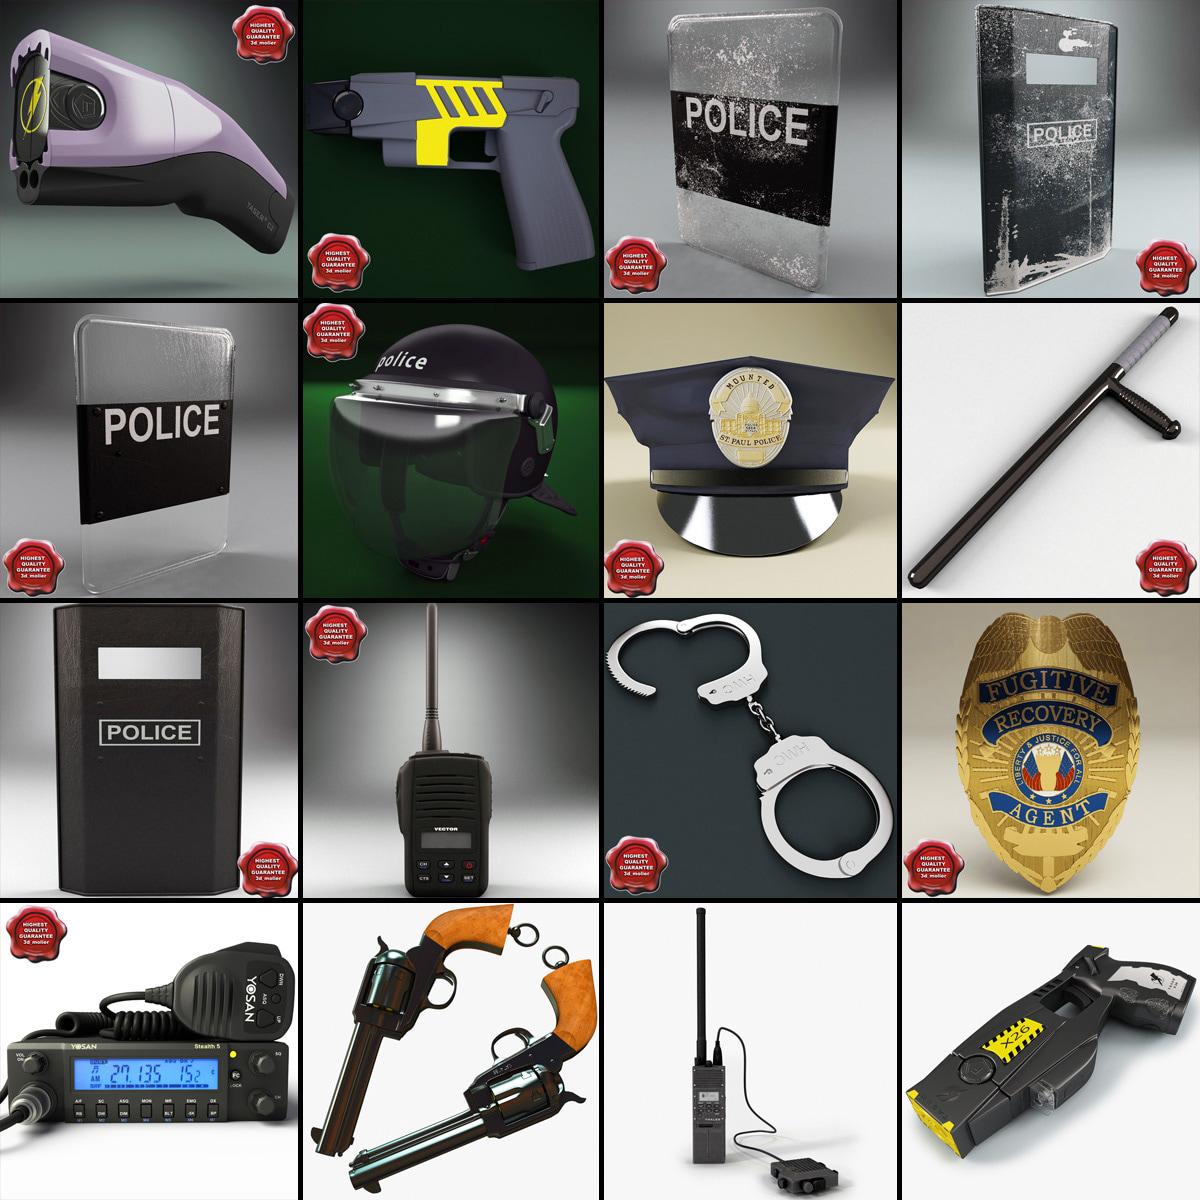 Police_Equipment_Collection_V4_000.jpg